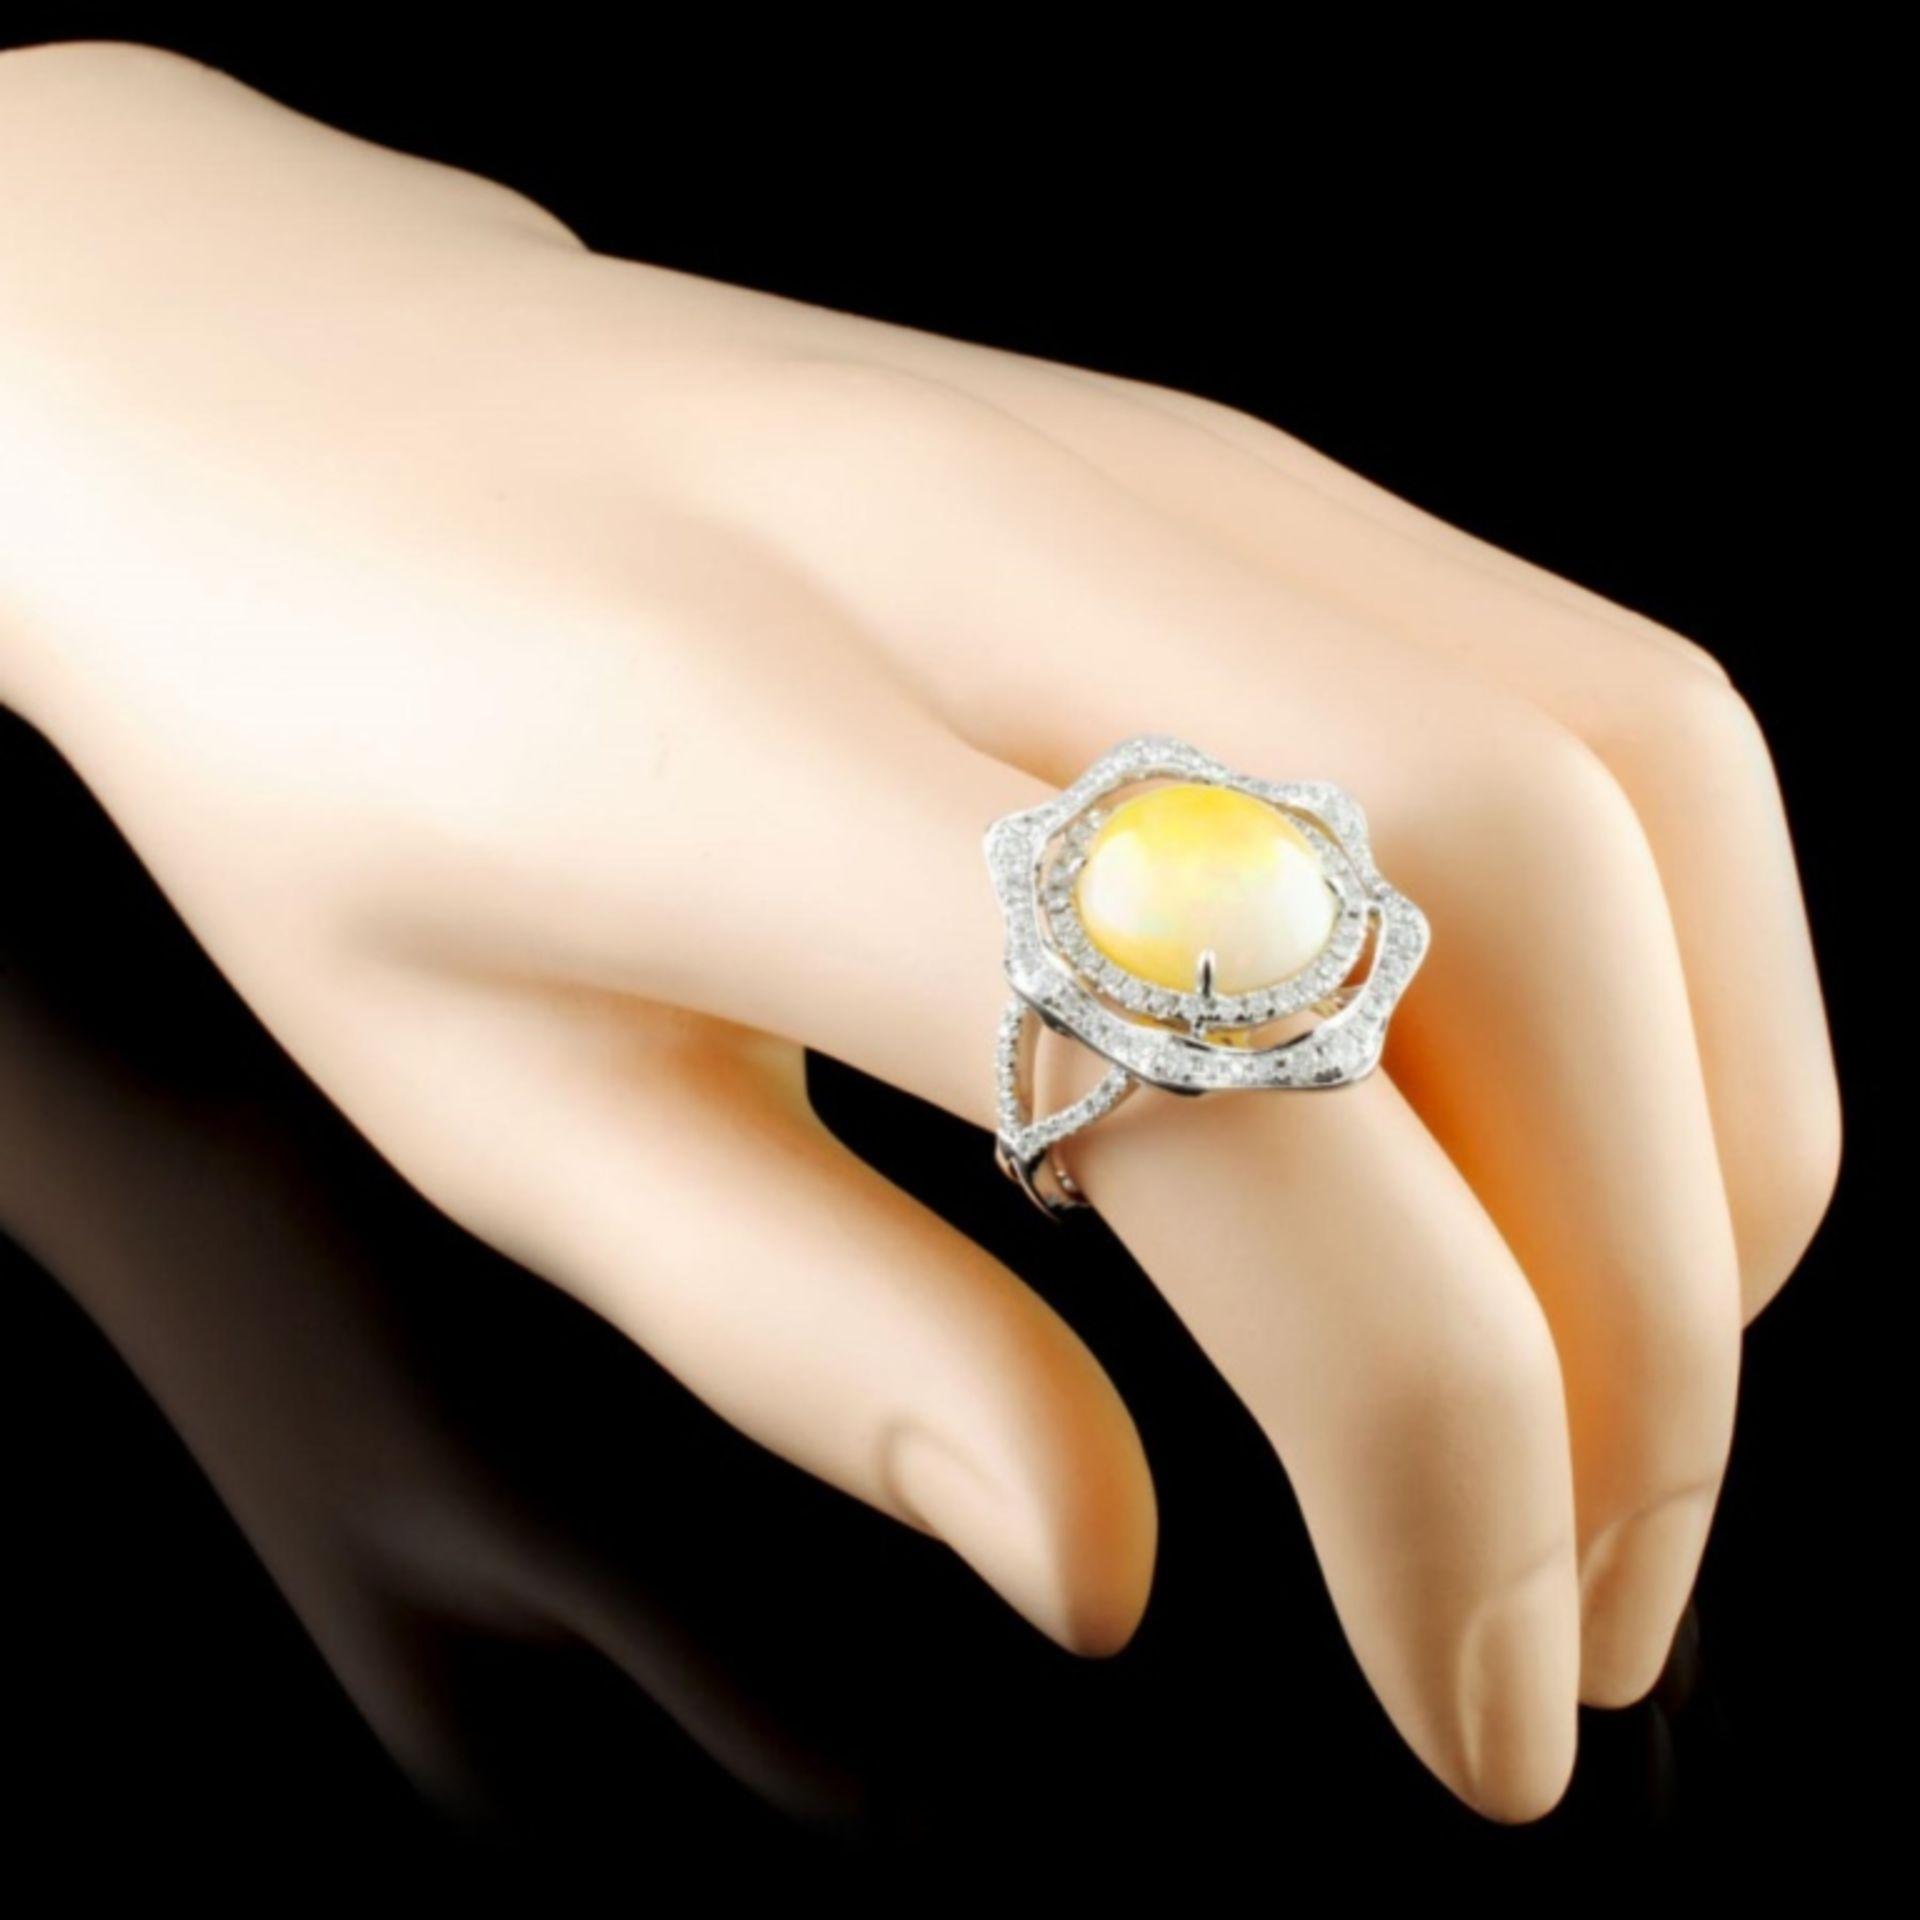 14K Gold 5.27ct Opal & 0.90ctw Diamond Ring - Image 3 of 4